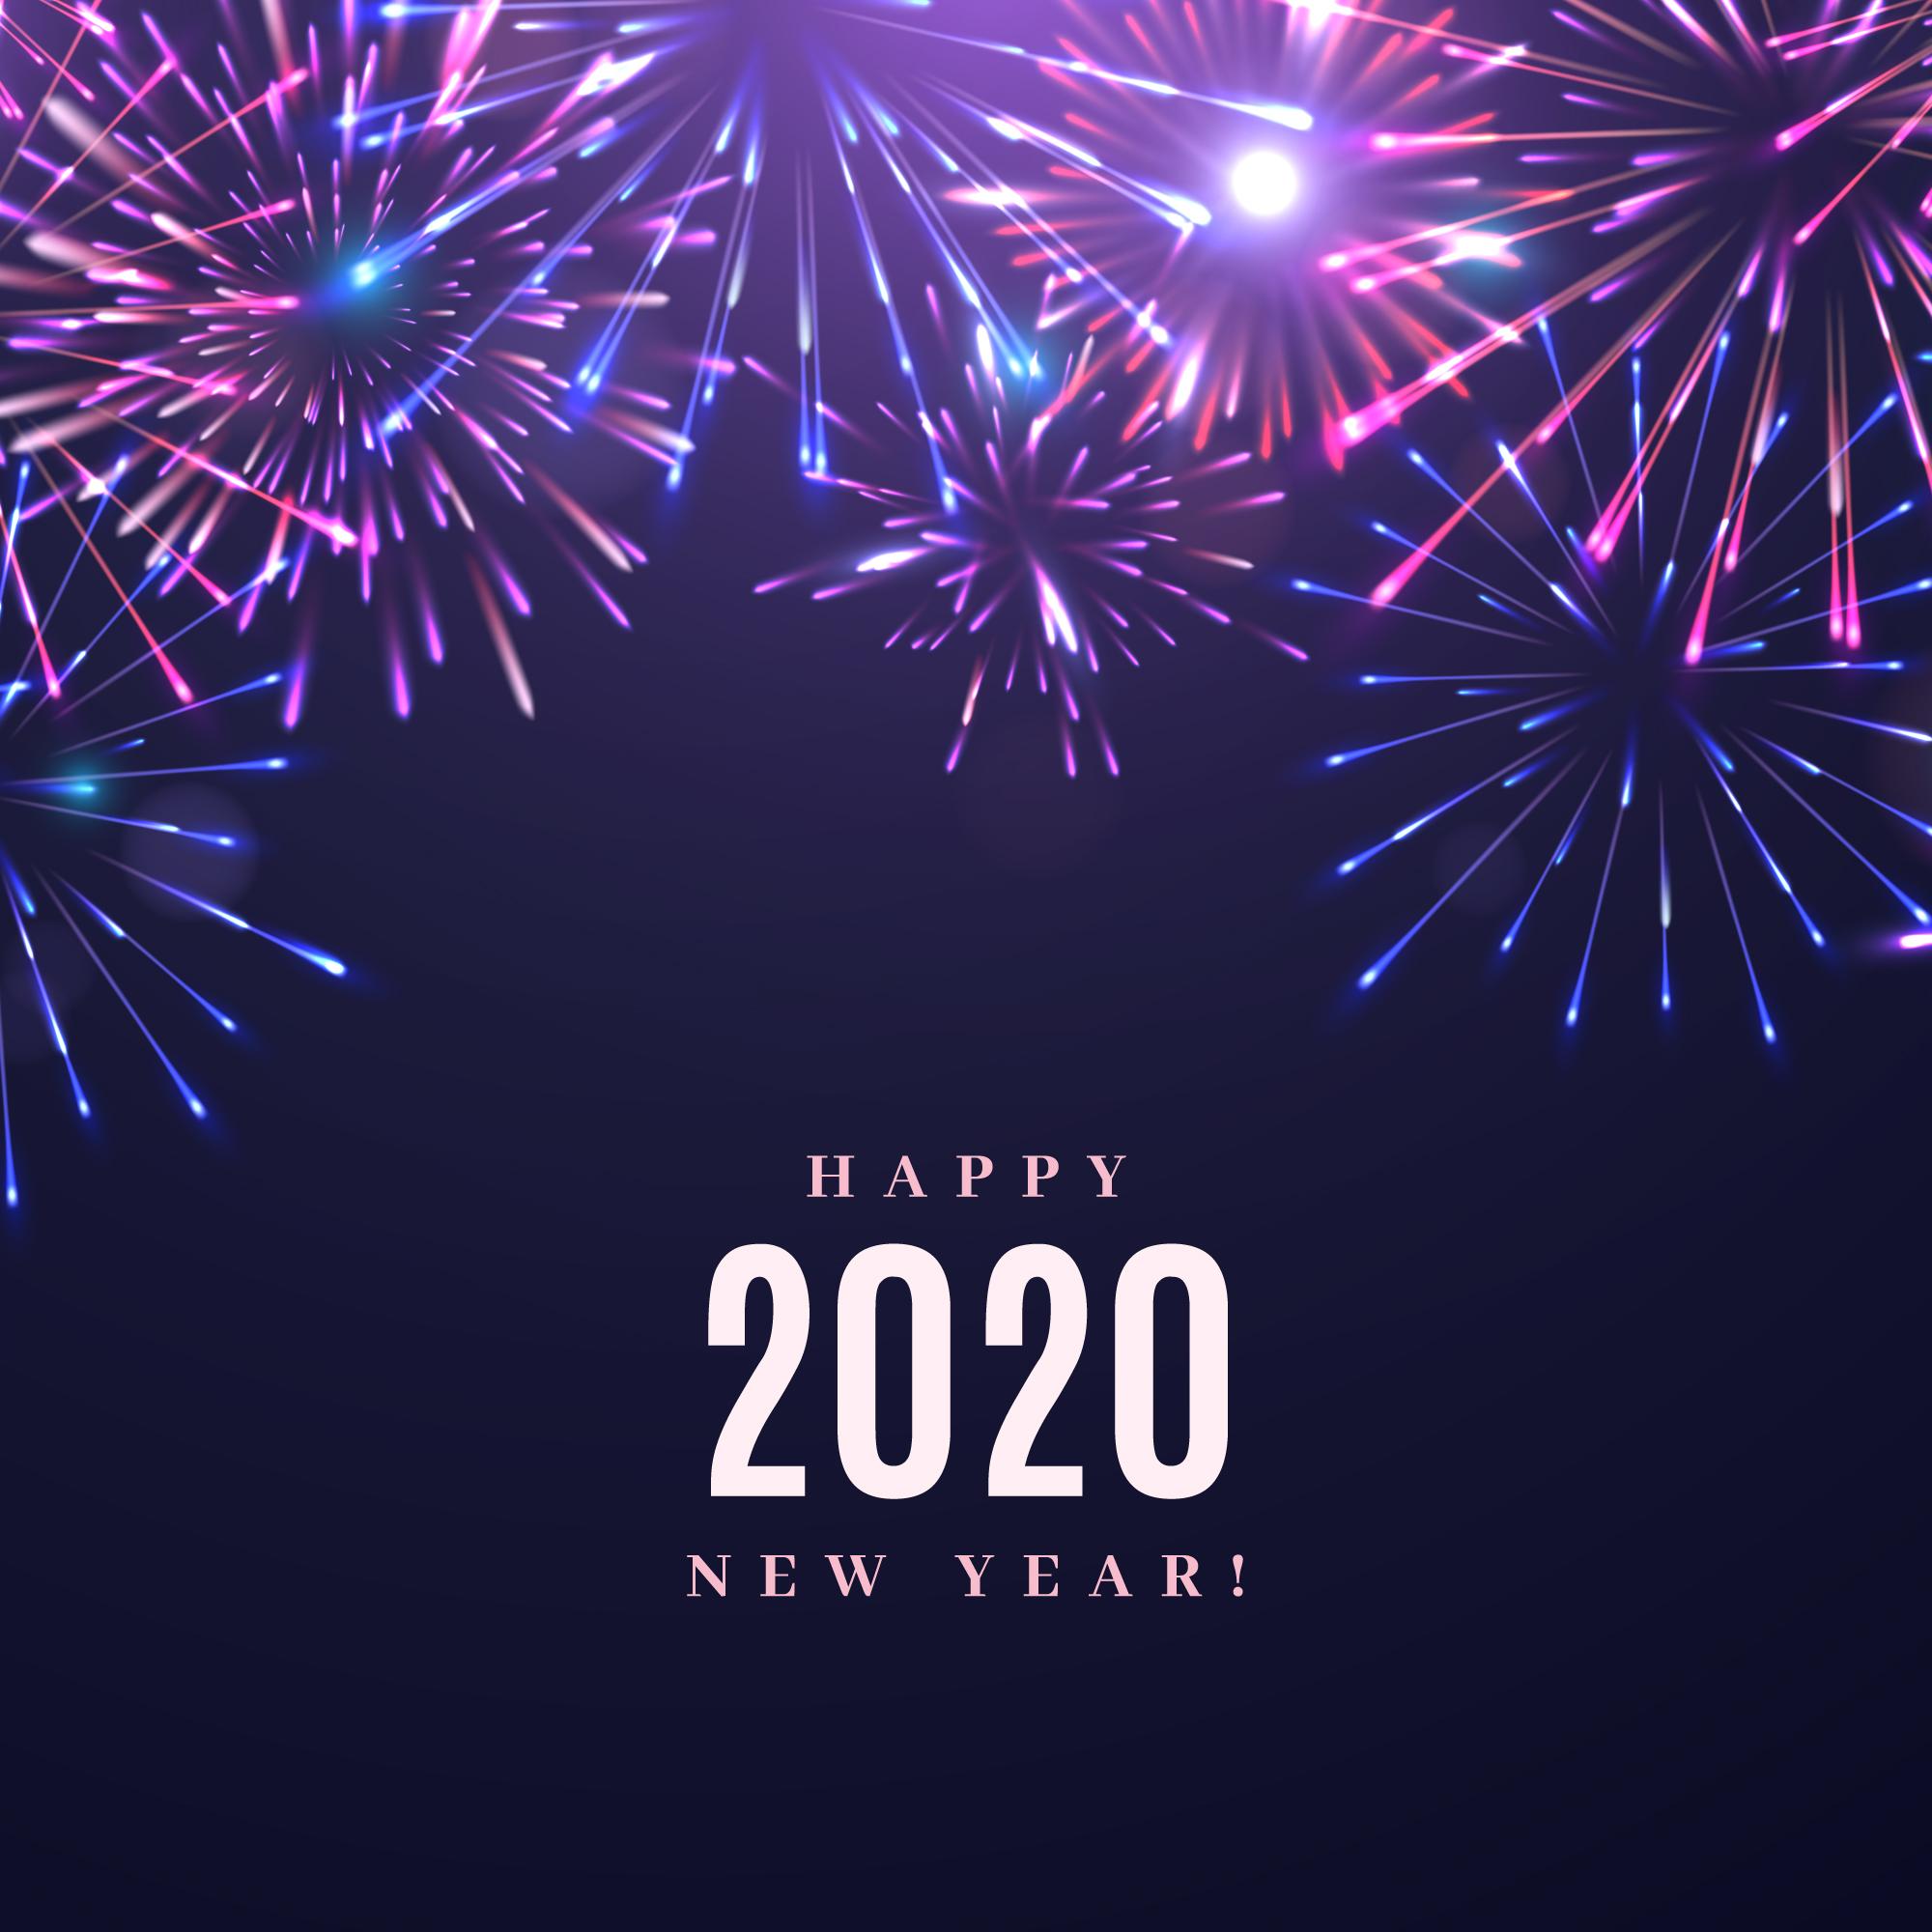 Fireworks New Year 2020 Card